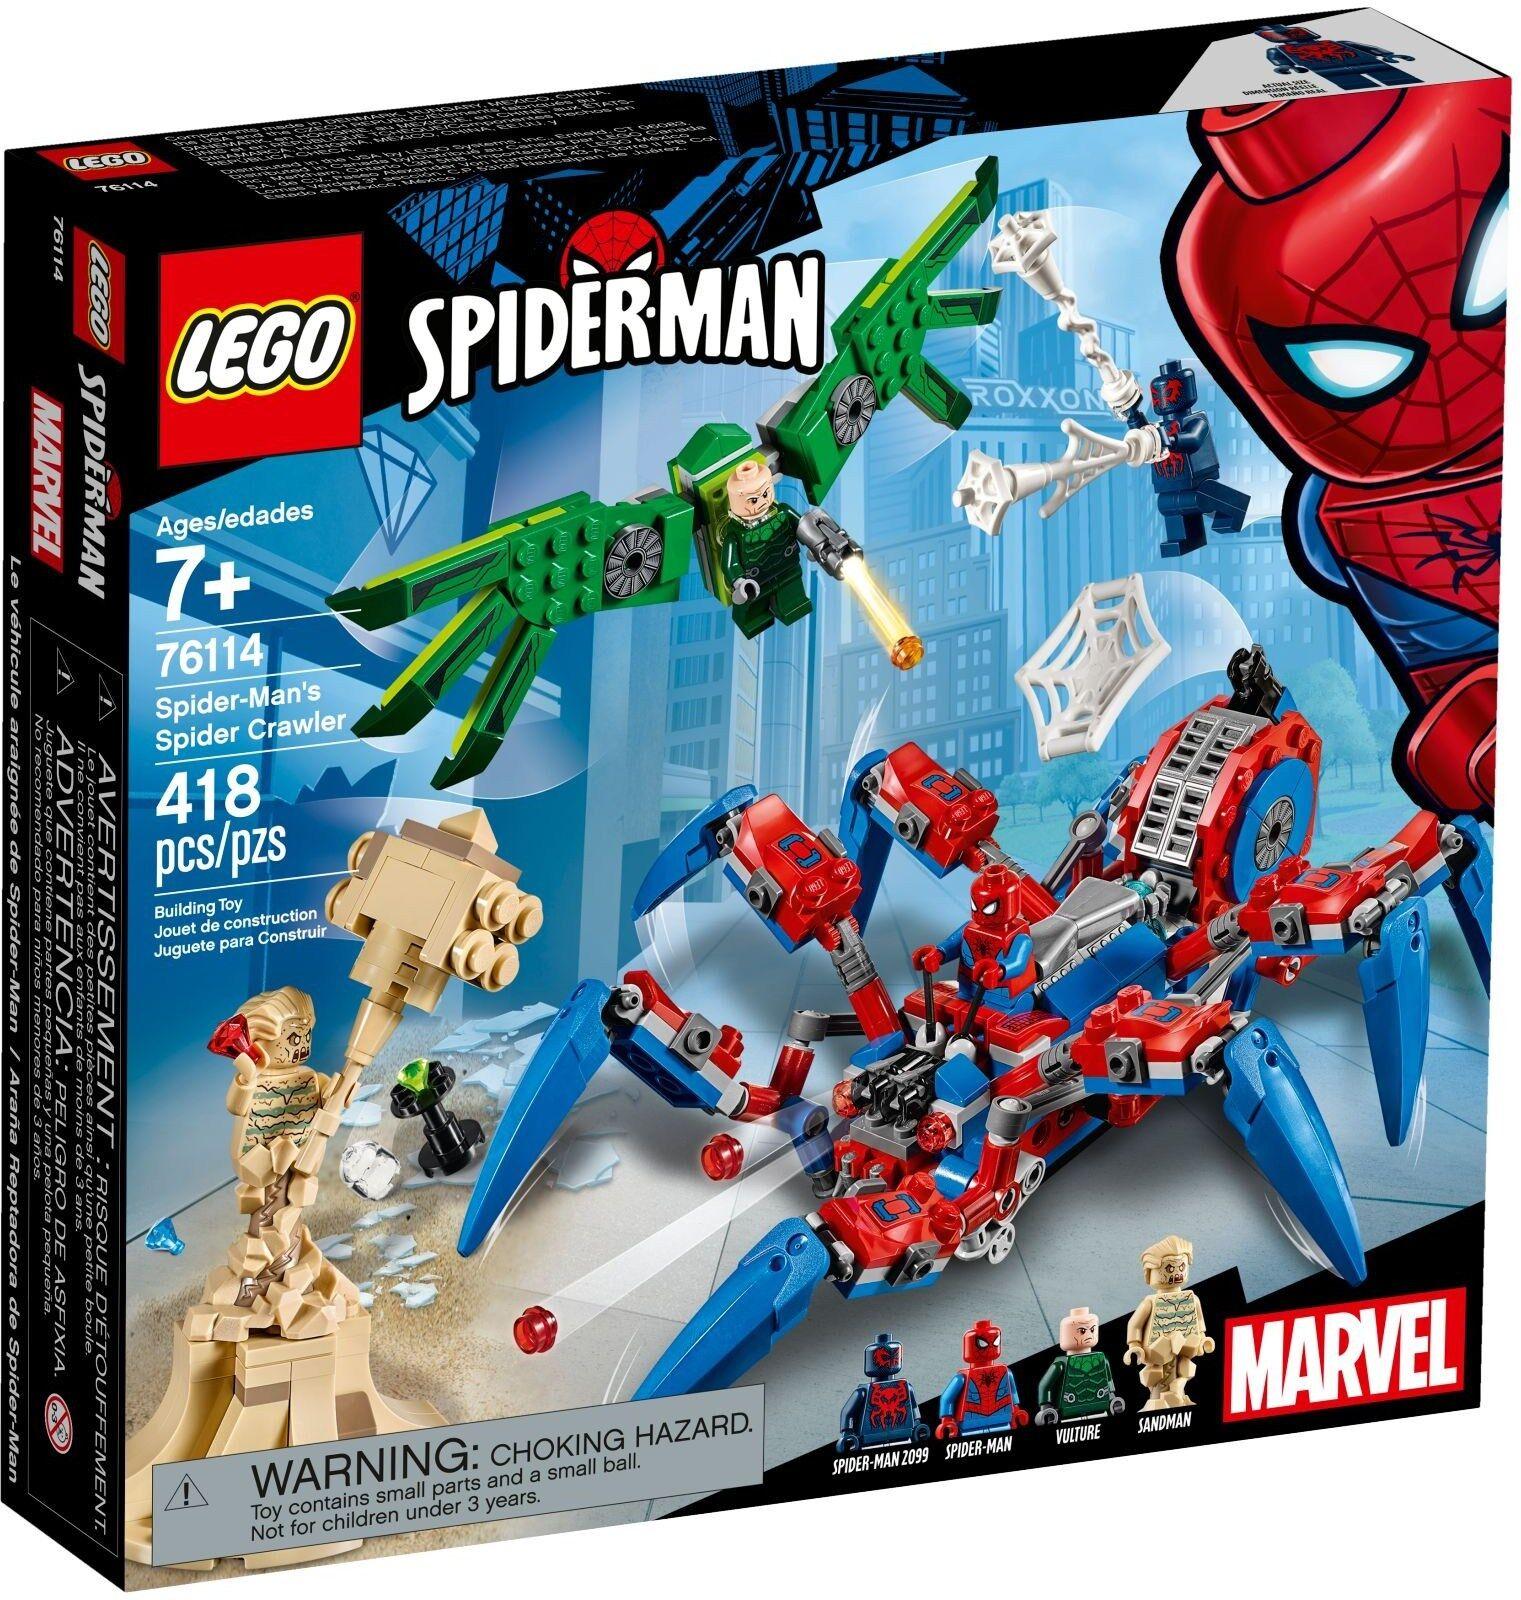 LEGO Marvel Superheroes Superheroes Superheroes - 76114 Spider-Mans spinnenkrabbler-NOUVEAU & NEUF dans sa boîte 2b8cd1